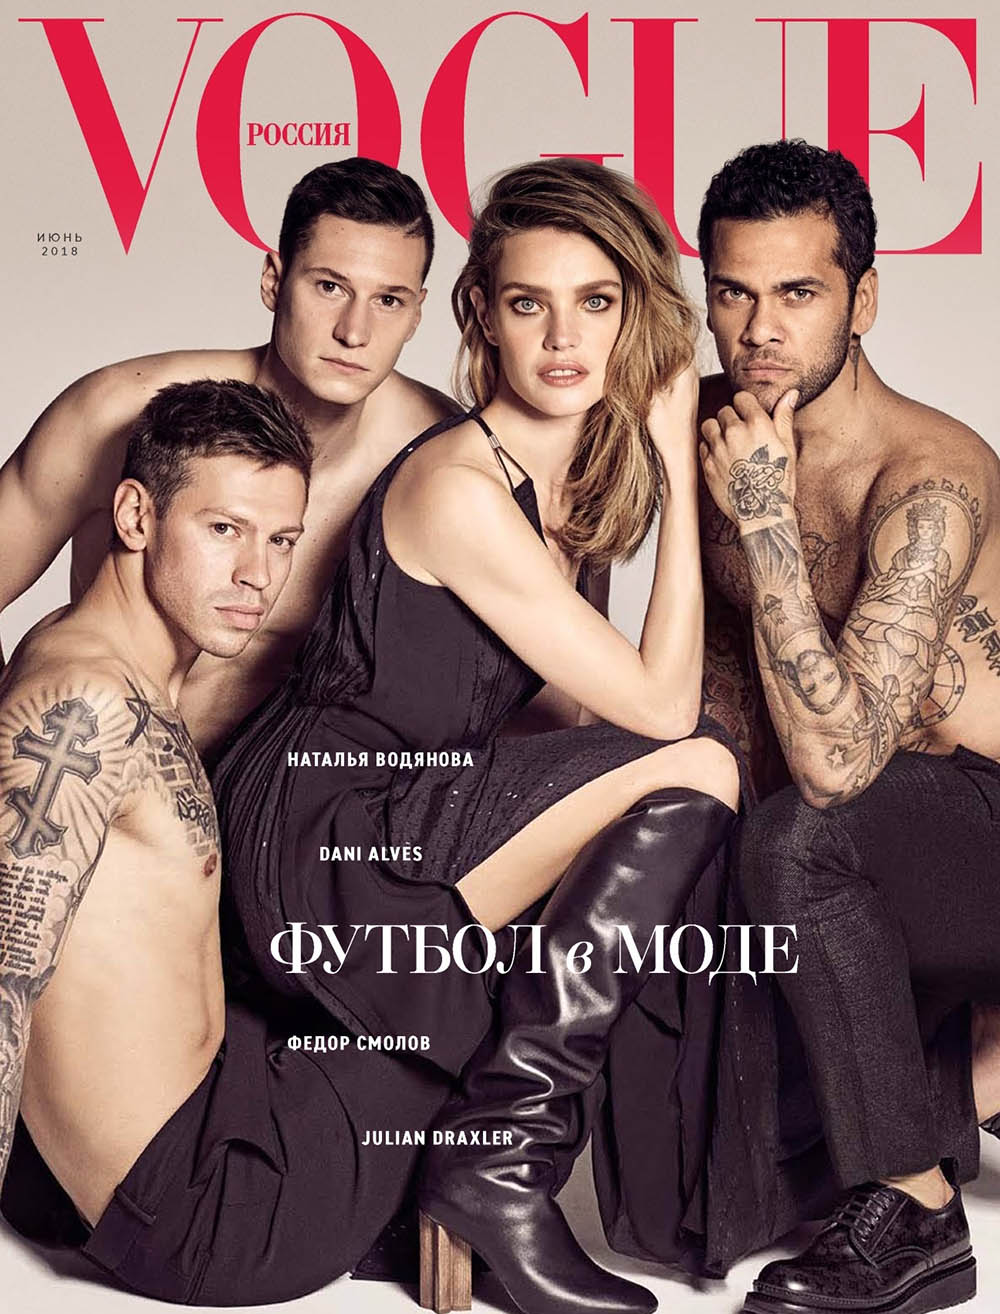 Natalia Vodianova, Julian Draxler, Fedor Smolov and Dani Alves cover Vogue Russia June 2018 by Luigi & Iango